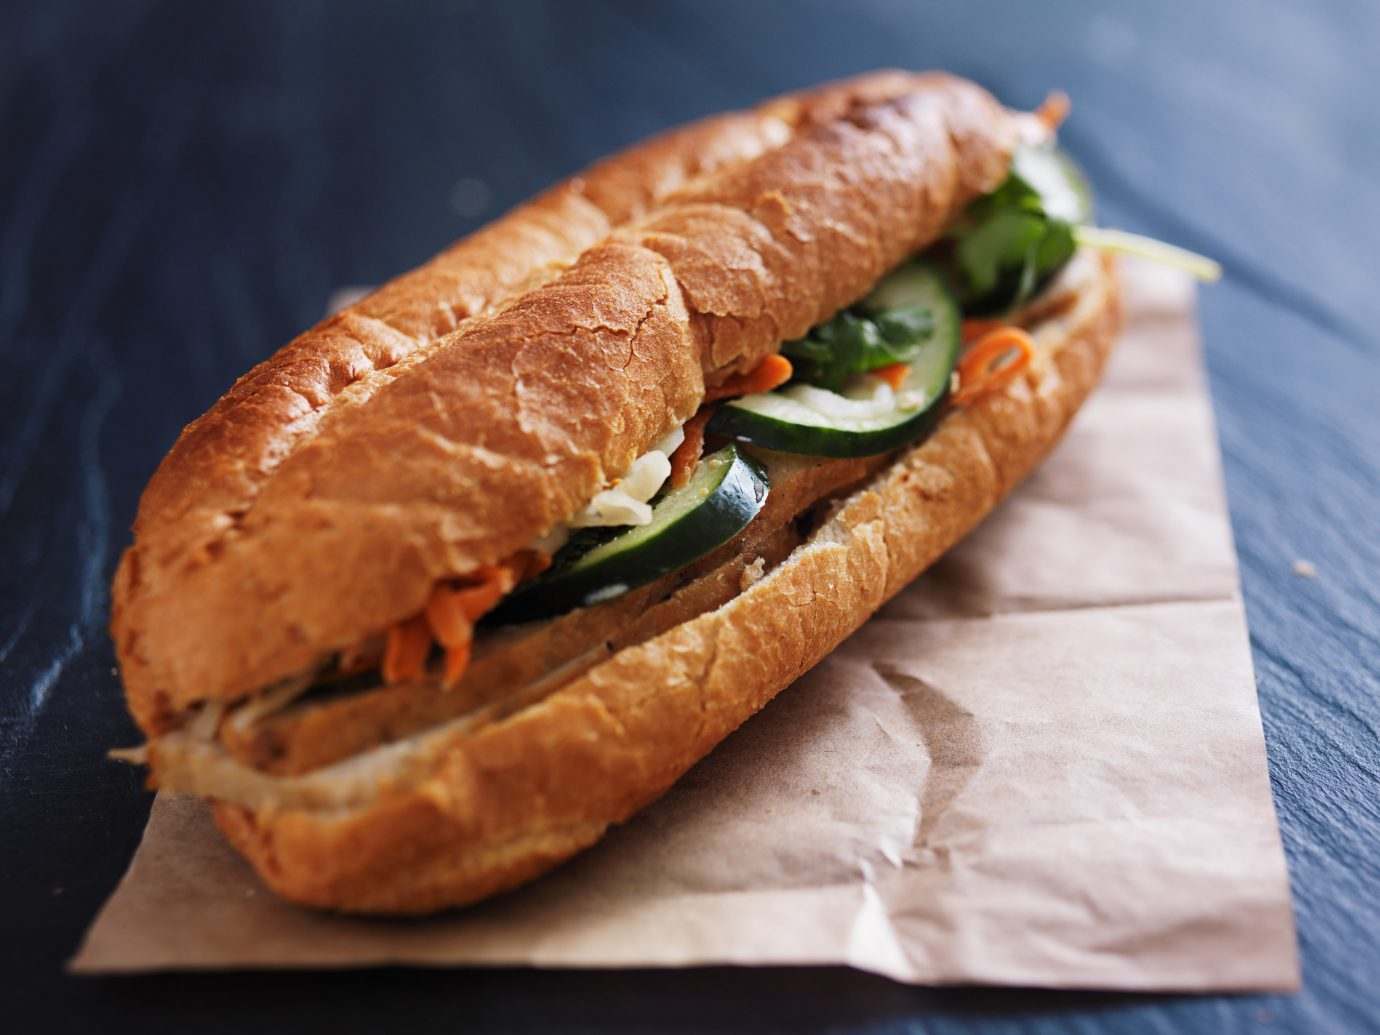 Trip Ideas food paper dish bánh mì snack food sandwich produce veggie burger meat ciabatta baguette close